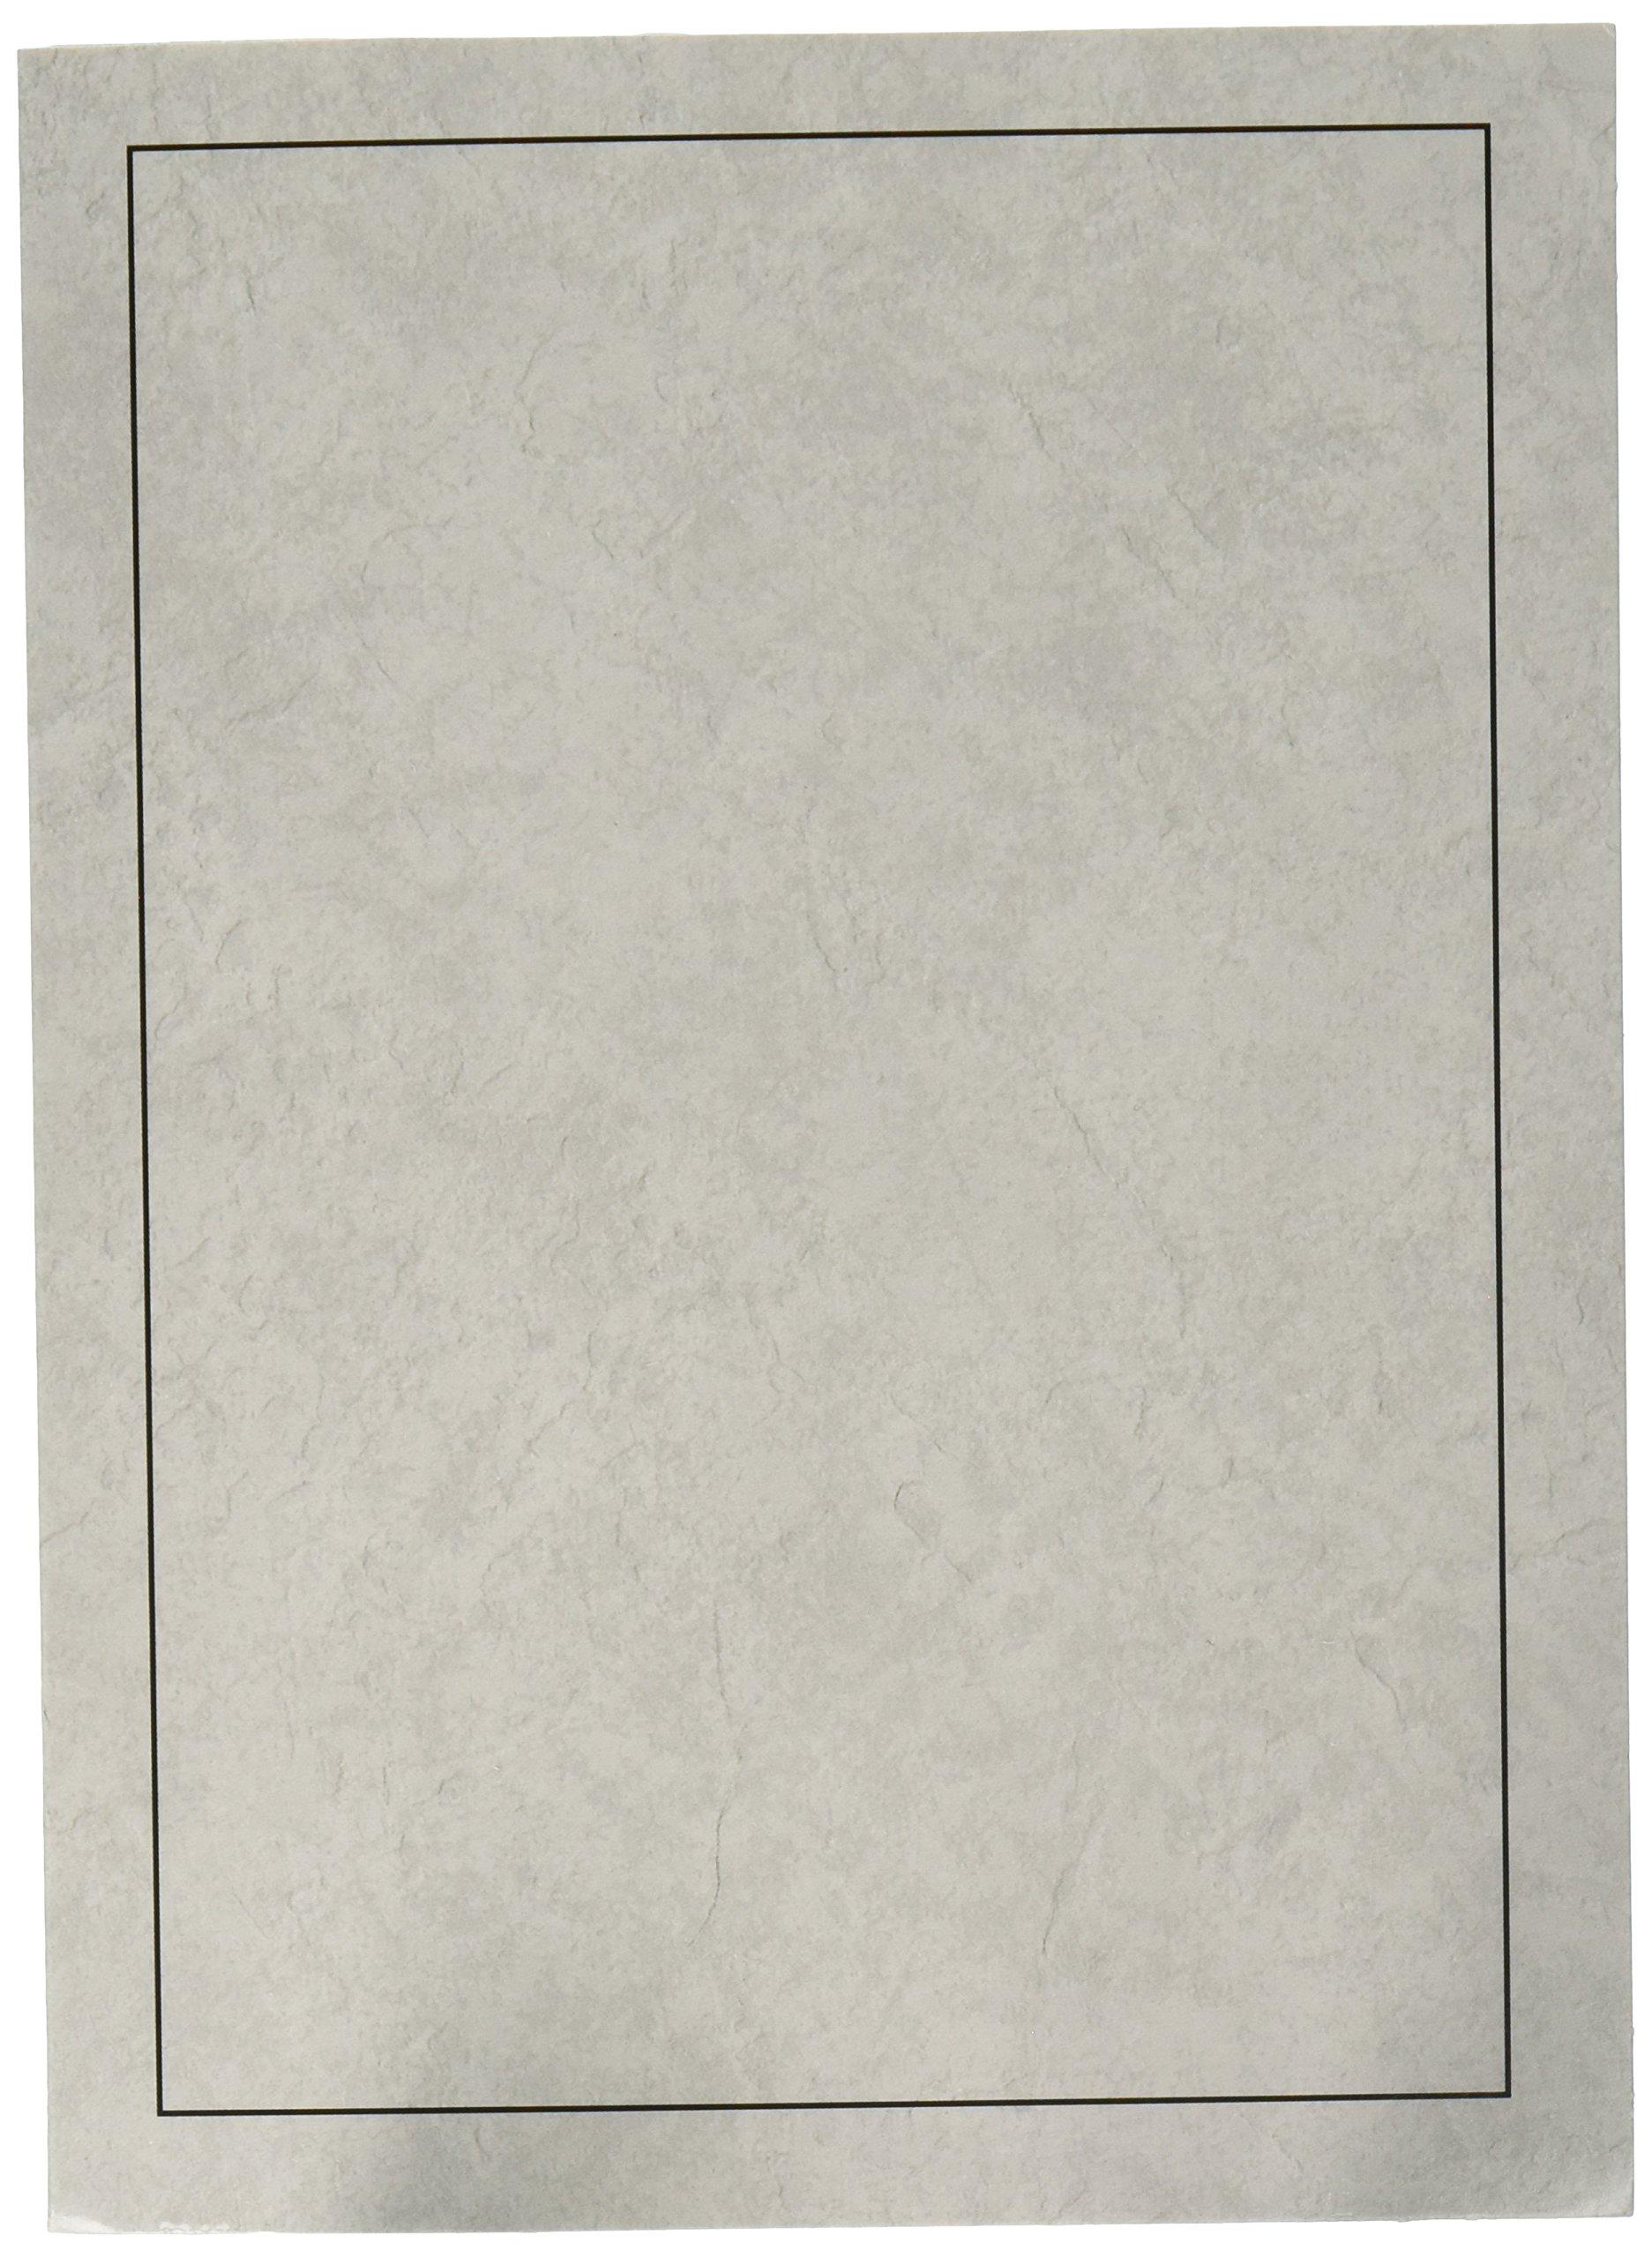 Cardboard Photo Folder for a 5x7 Photo (Pack 0f 100) Light Gray